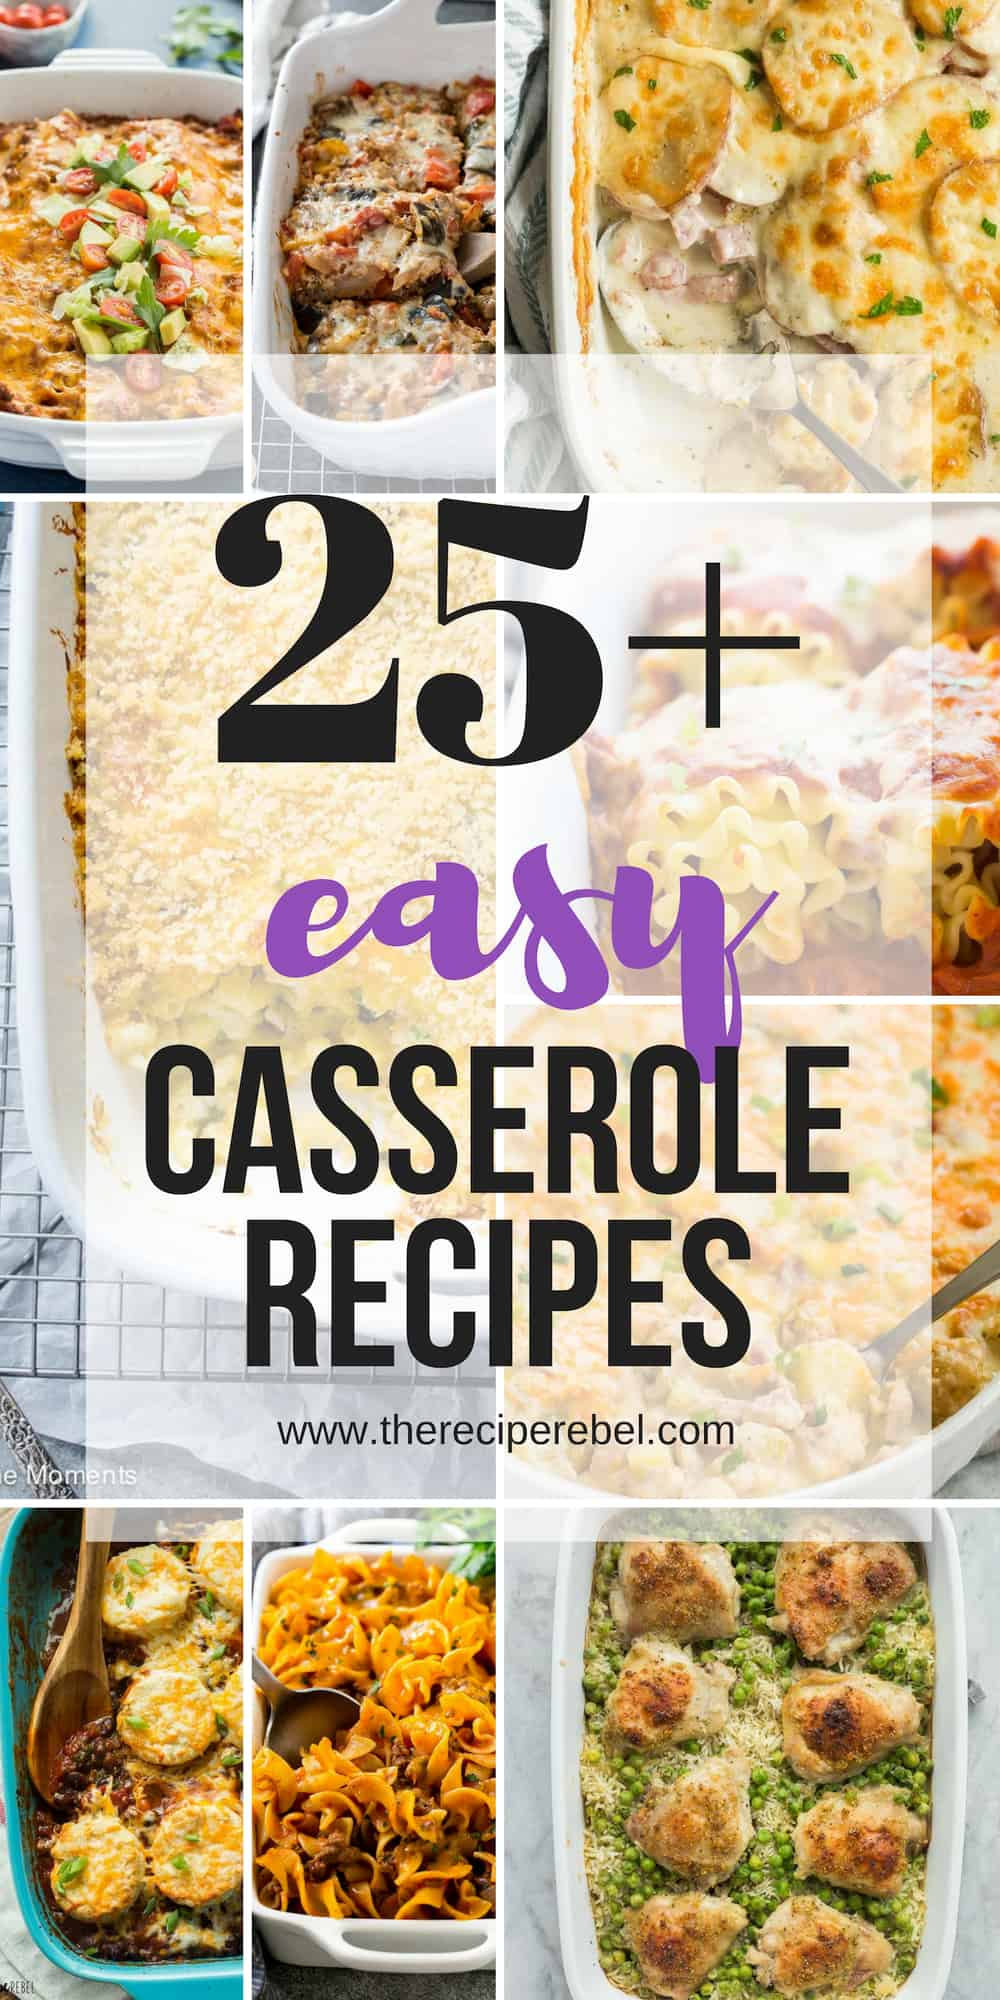 easy casserole recipes collage